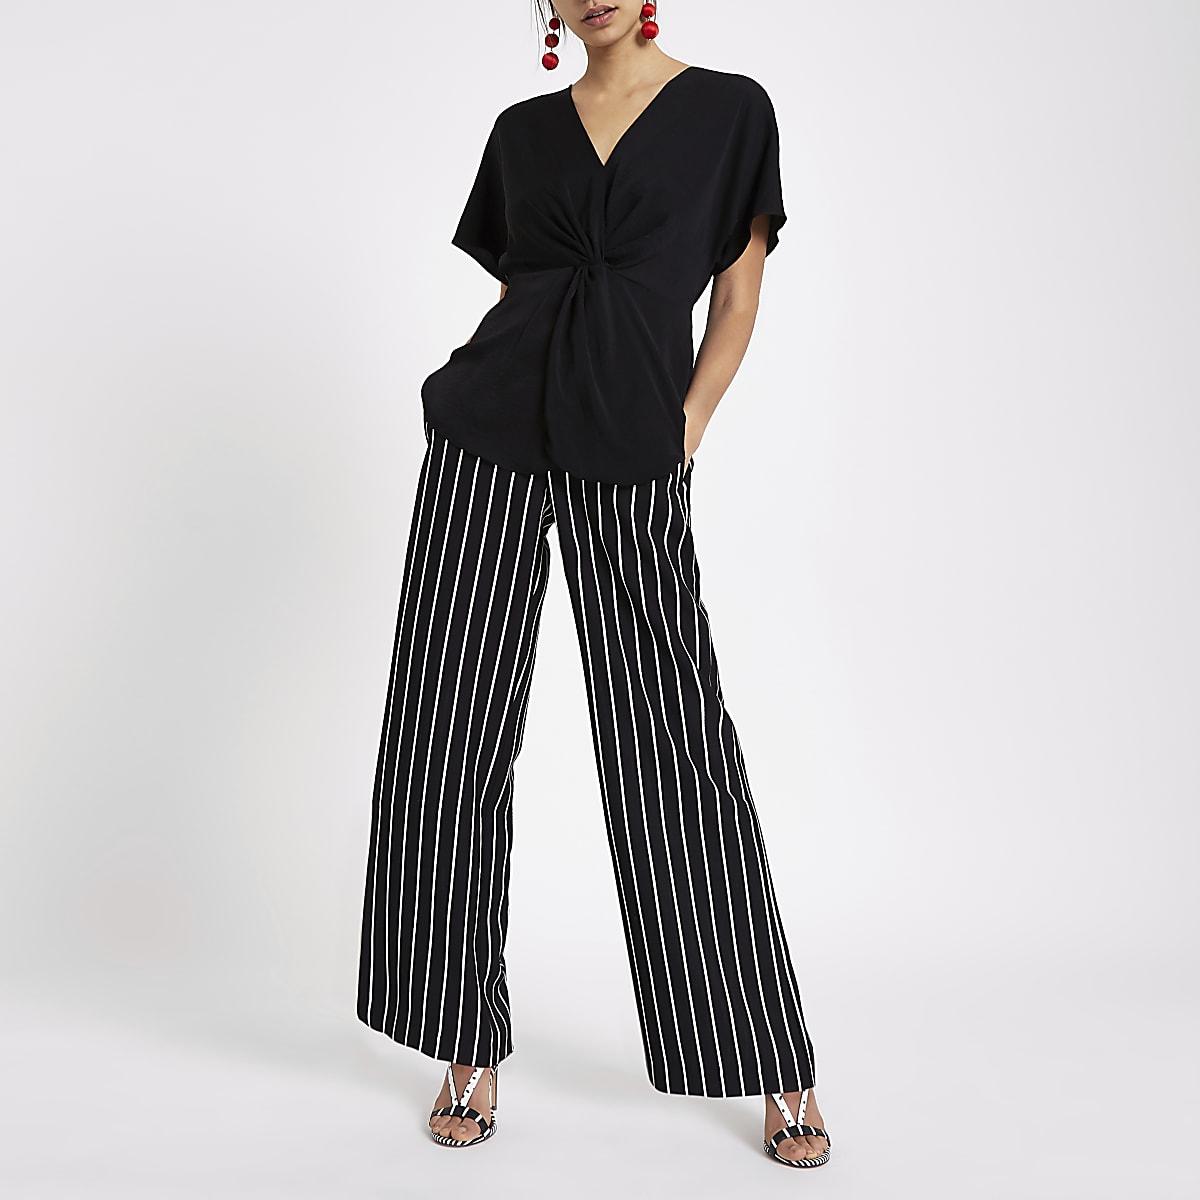 Black satin knot front shirt